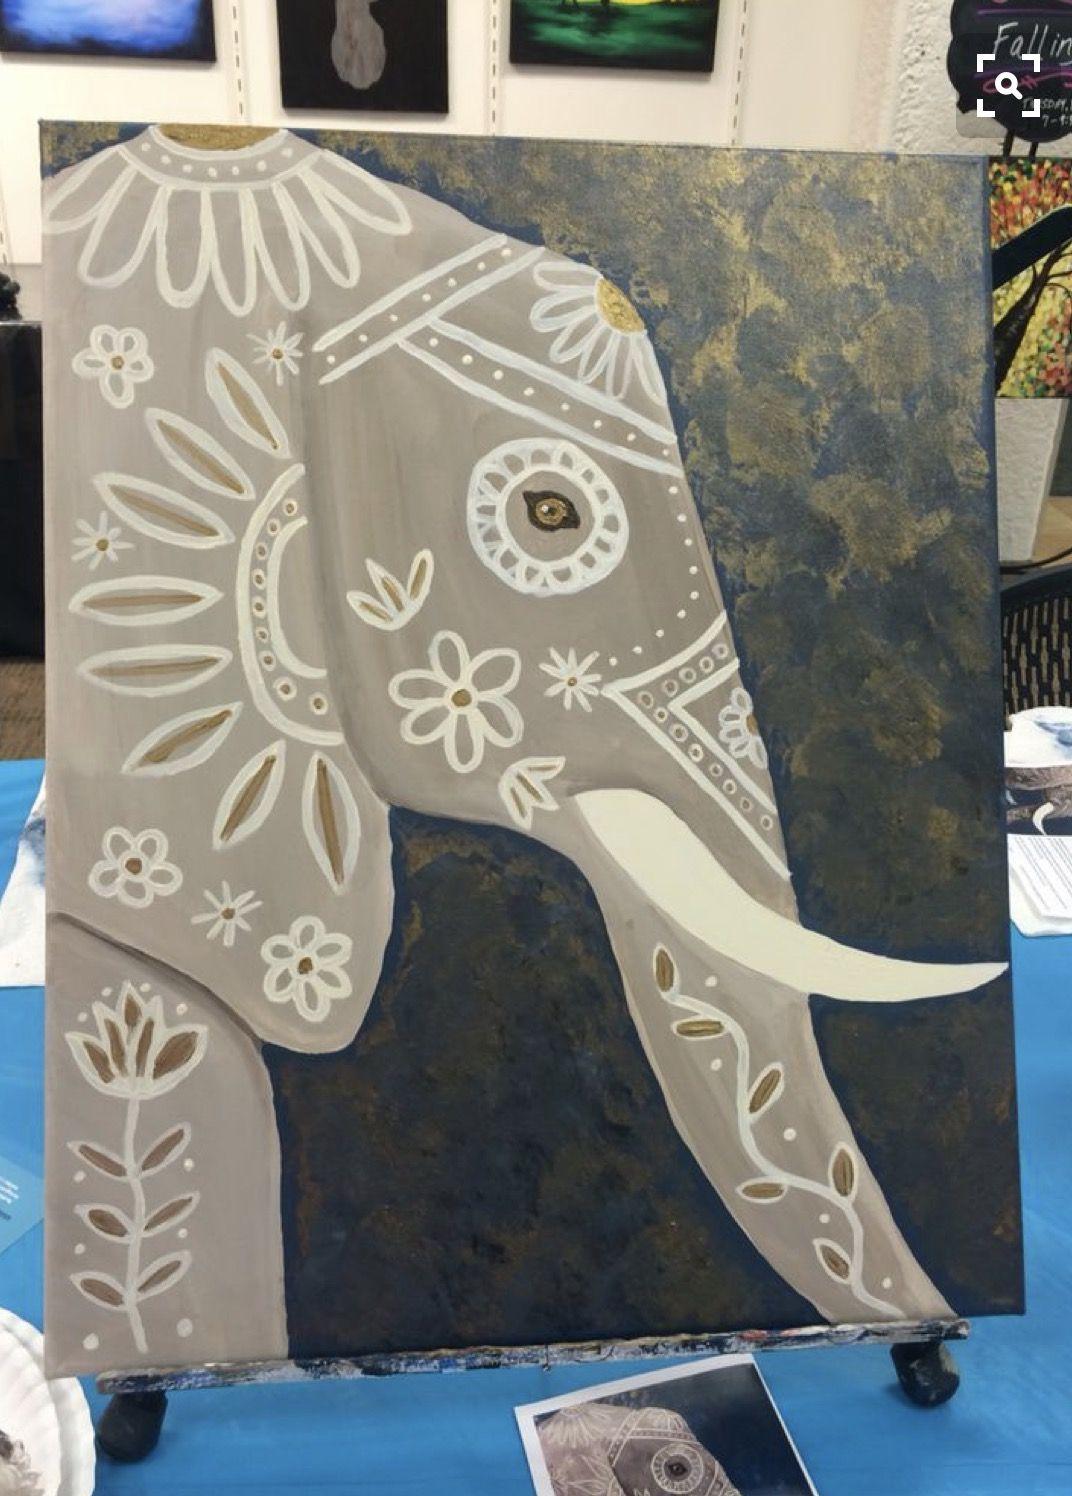 Pin de Jamie Wakefield en #Elephantastic | Pinterest | Cuadro ...